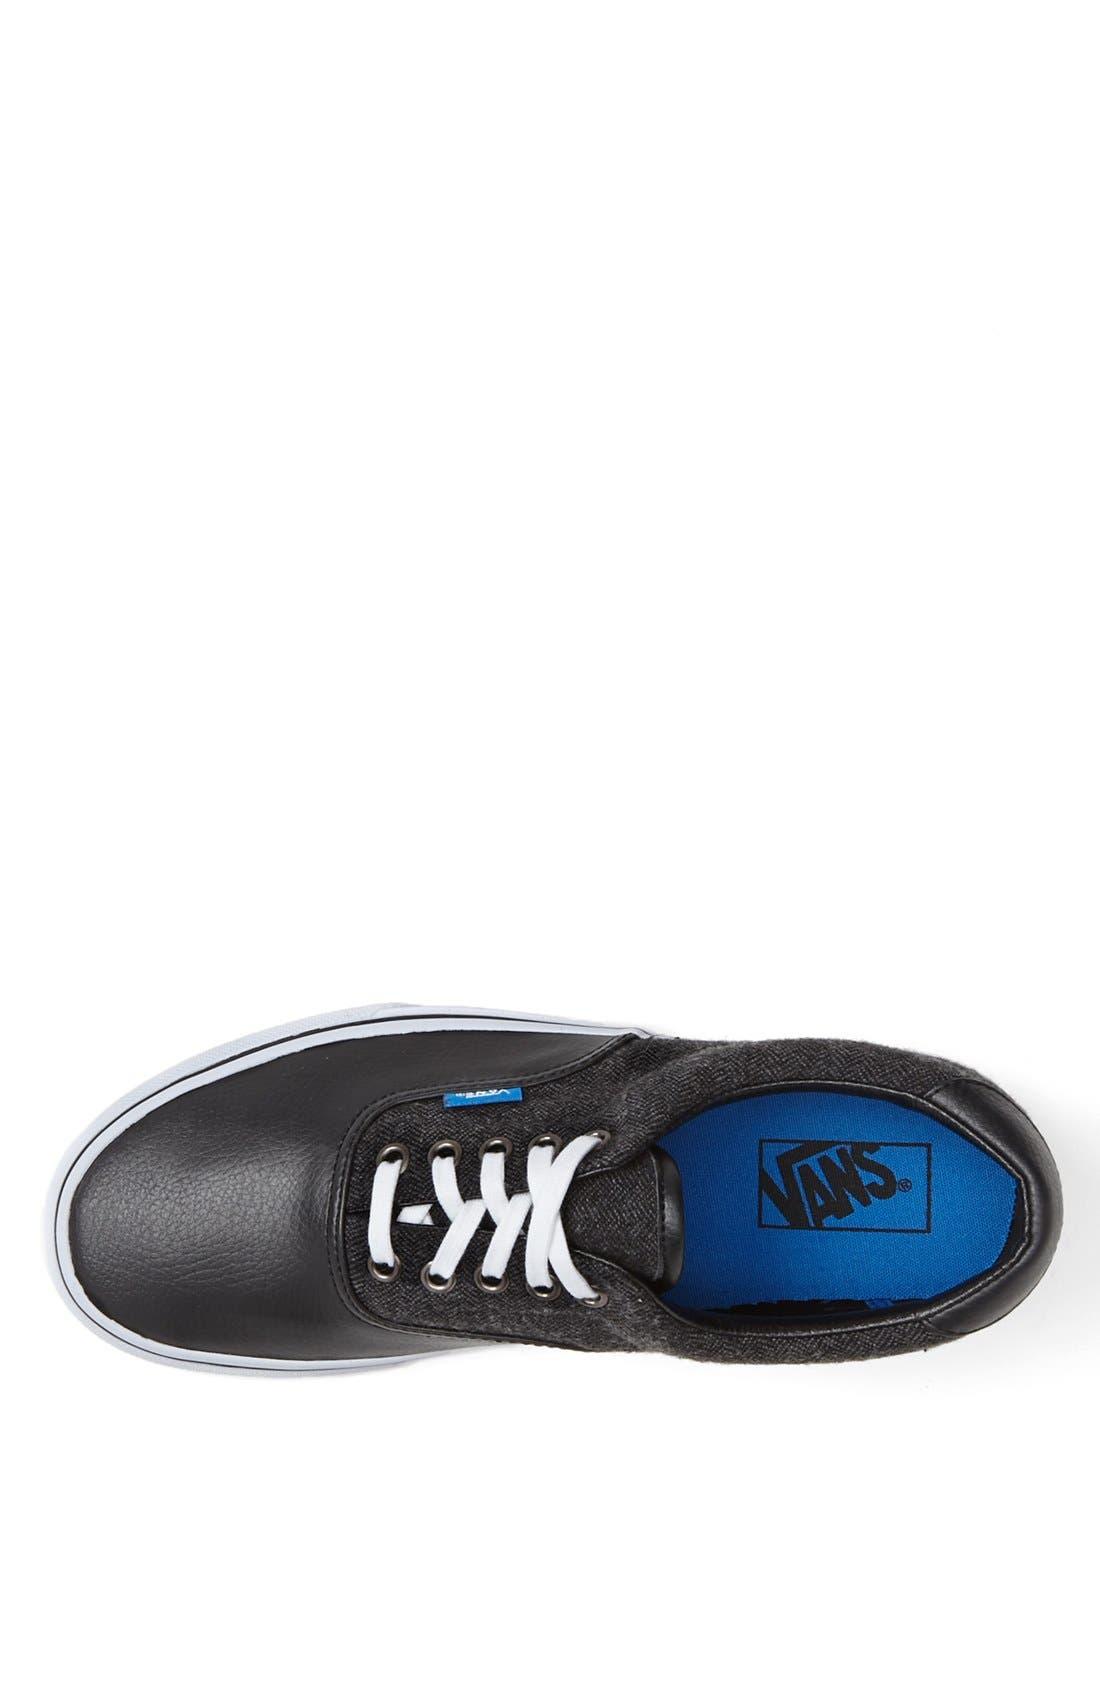 Alternate Image 3  - Vans 'Era 59' Sneaker (Men)